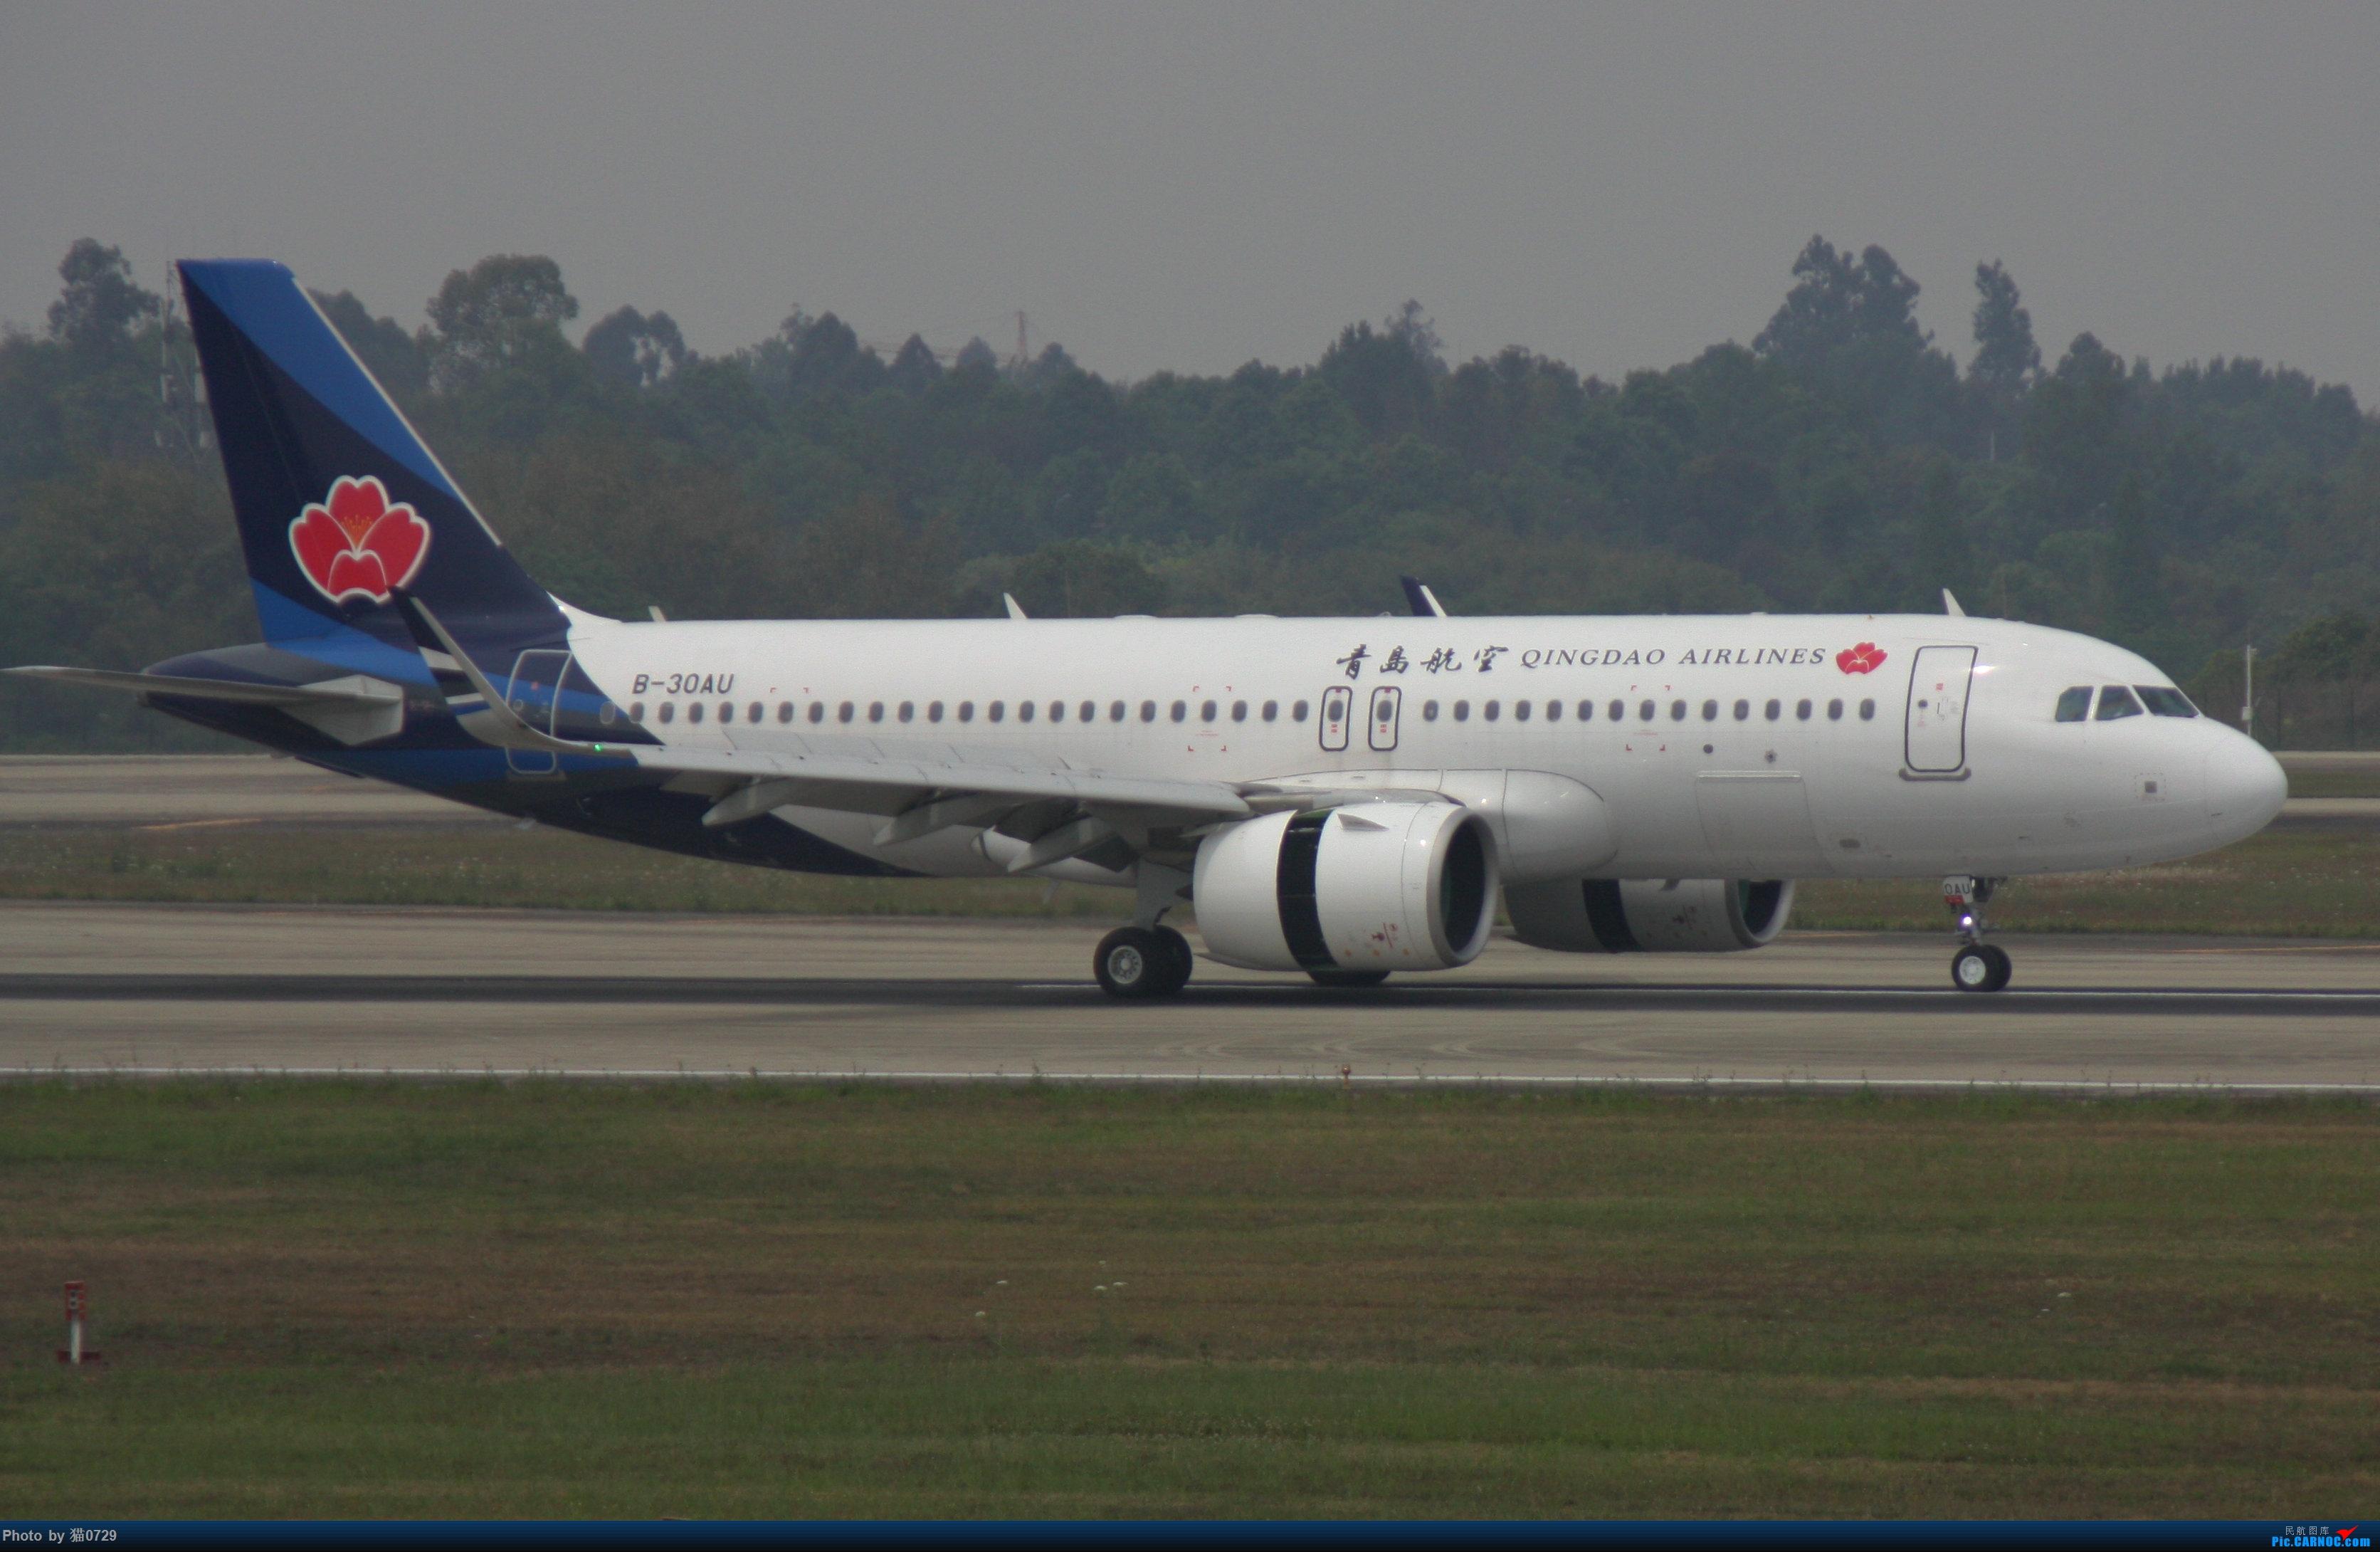 Re:[原创]CTU 119.425 水泥 伊朗346 巴基斯坦777 AIRBUS A320 B-30AU 中国成都双流国际机场